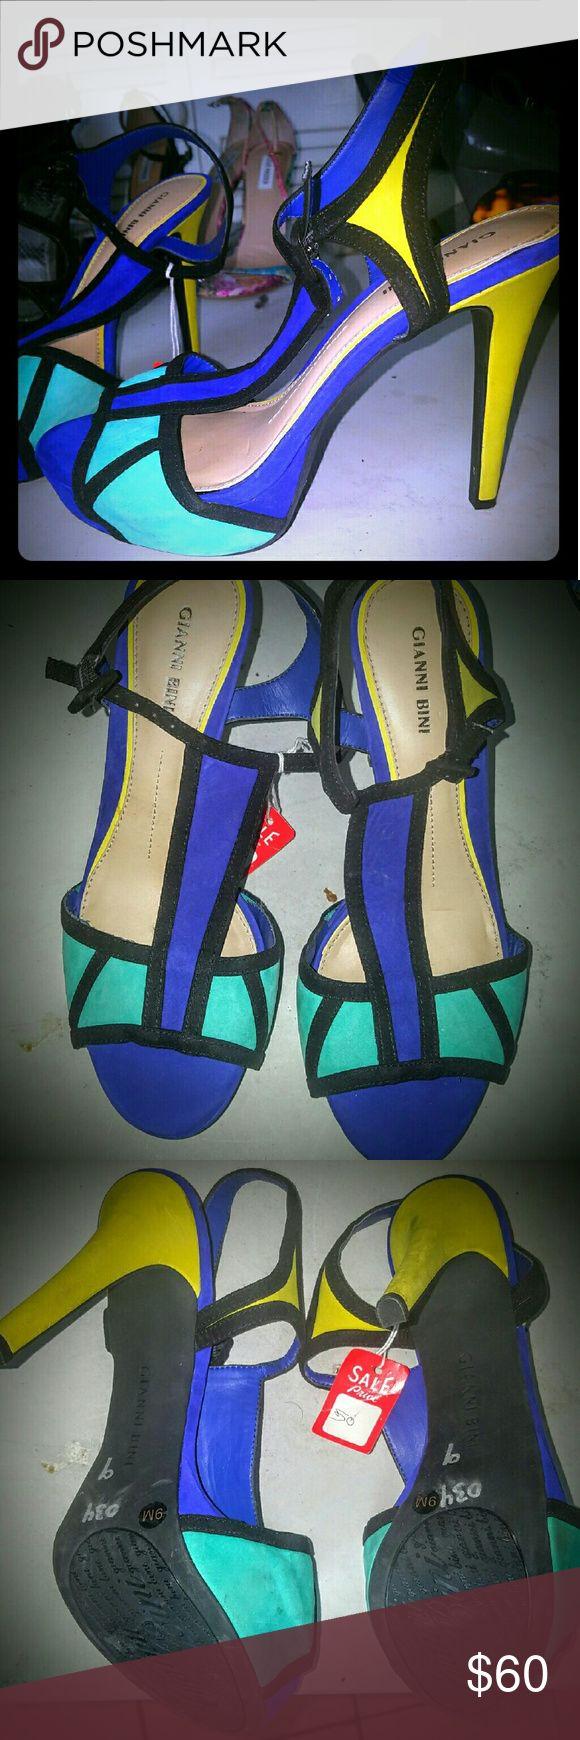 24hr Sale🛍 Beautiful Ganni Bini Color Block Heels Tri colored, Blue, Teal and Yellowish Lime shoes. Gianni Bini Shoes Heels